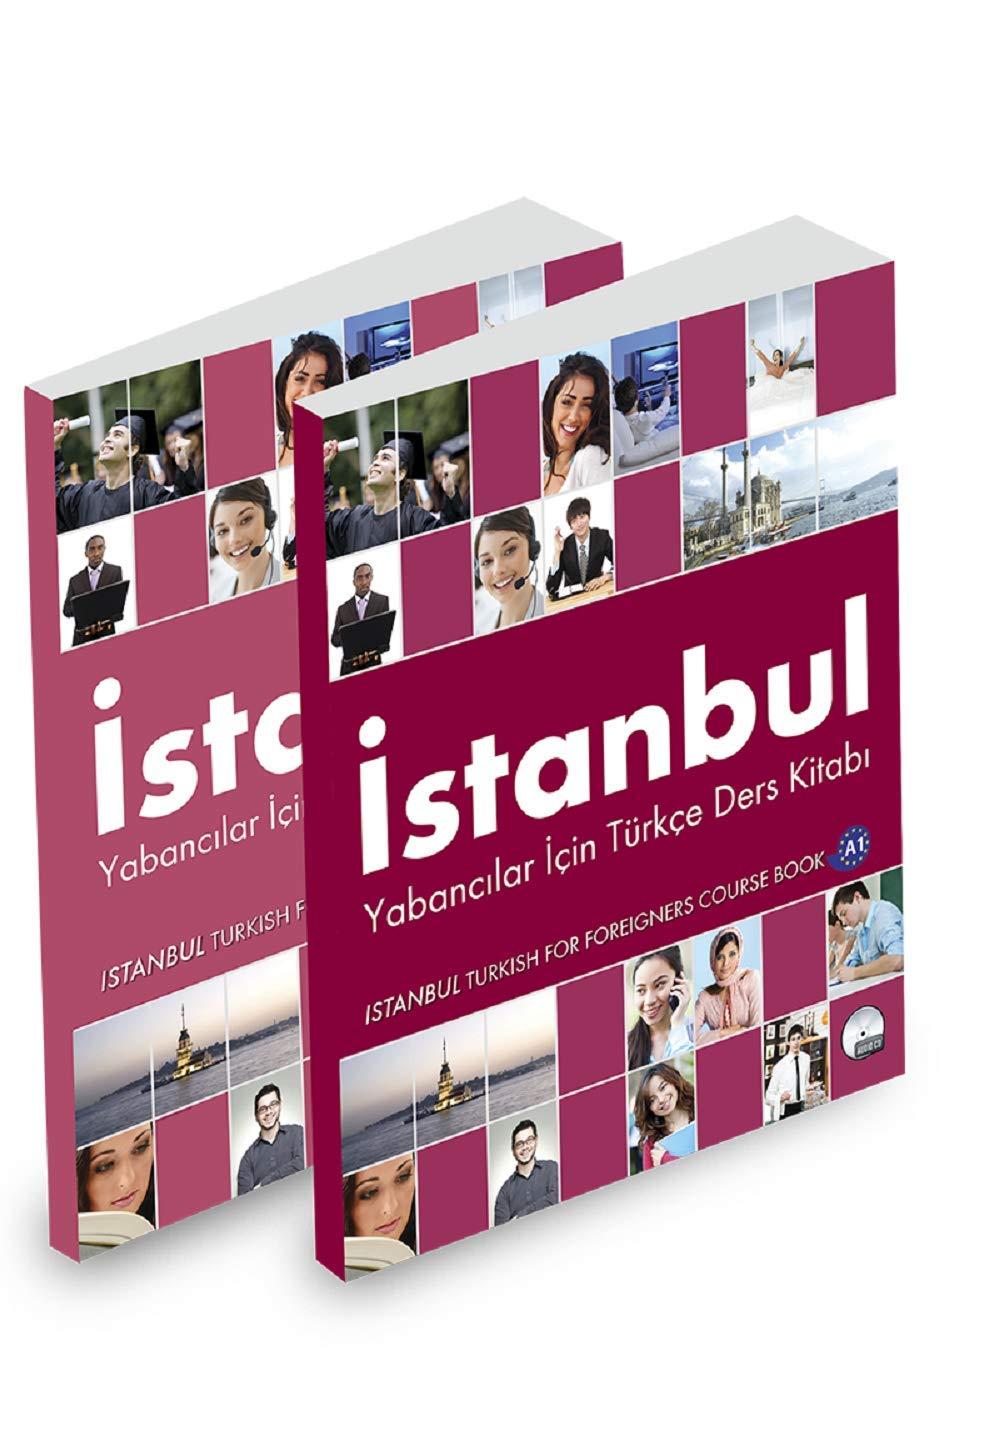 حل كتاب اسطنبول a2